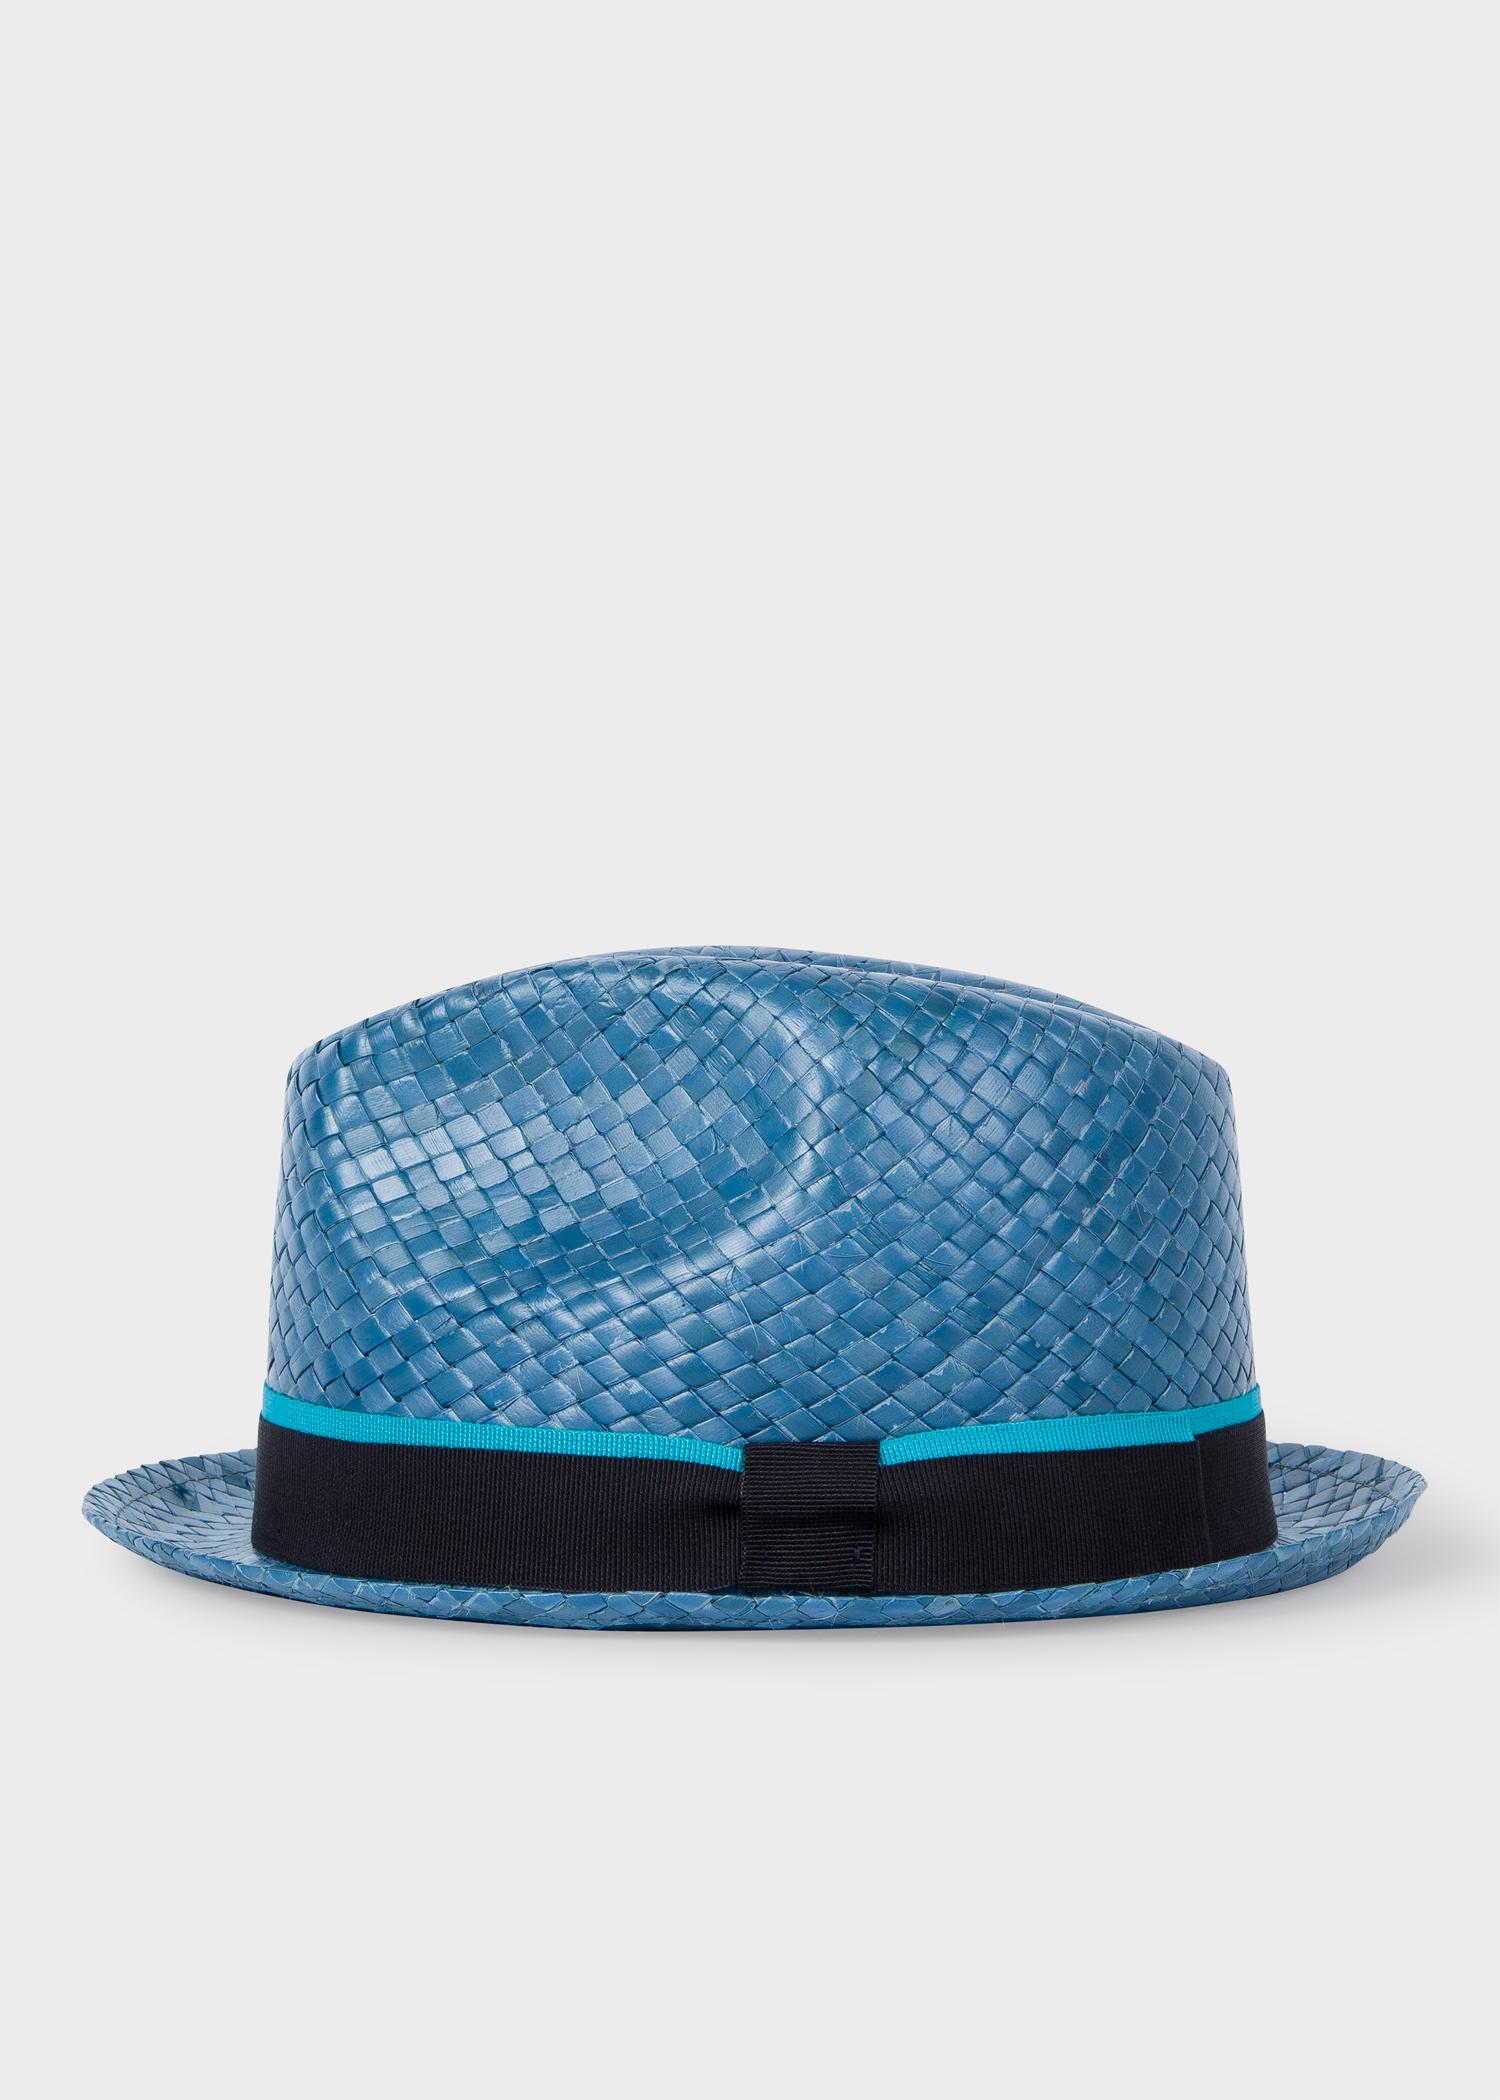 6de6e6b4 Side view - Men's Slate Blue Woven Trilby Hat Paul Smith